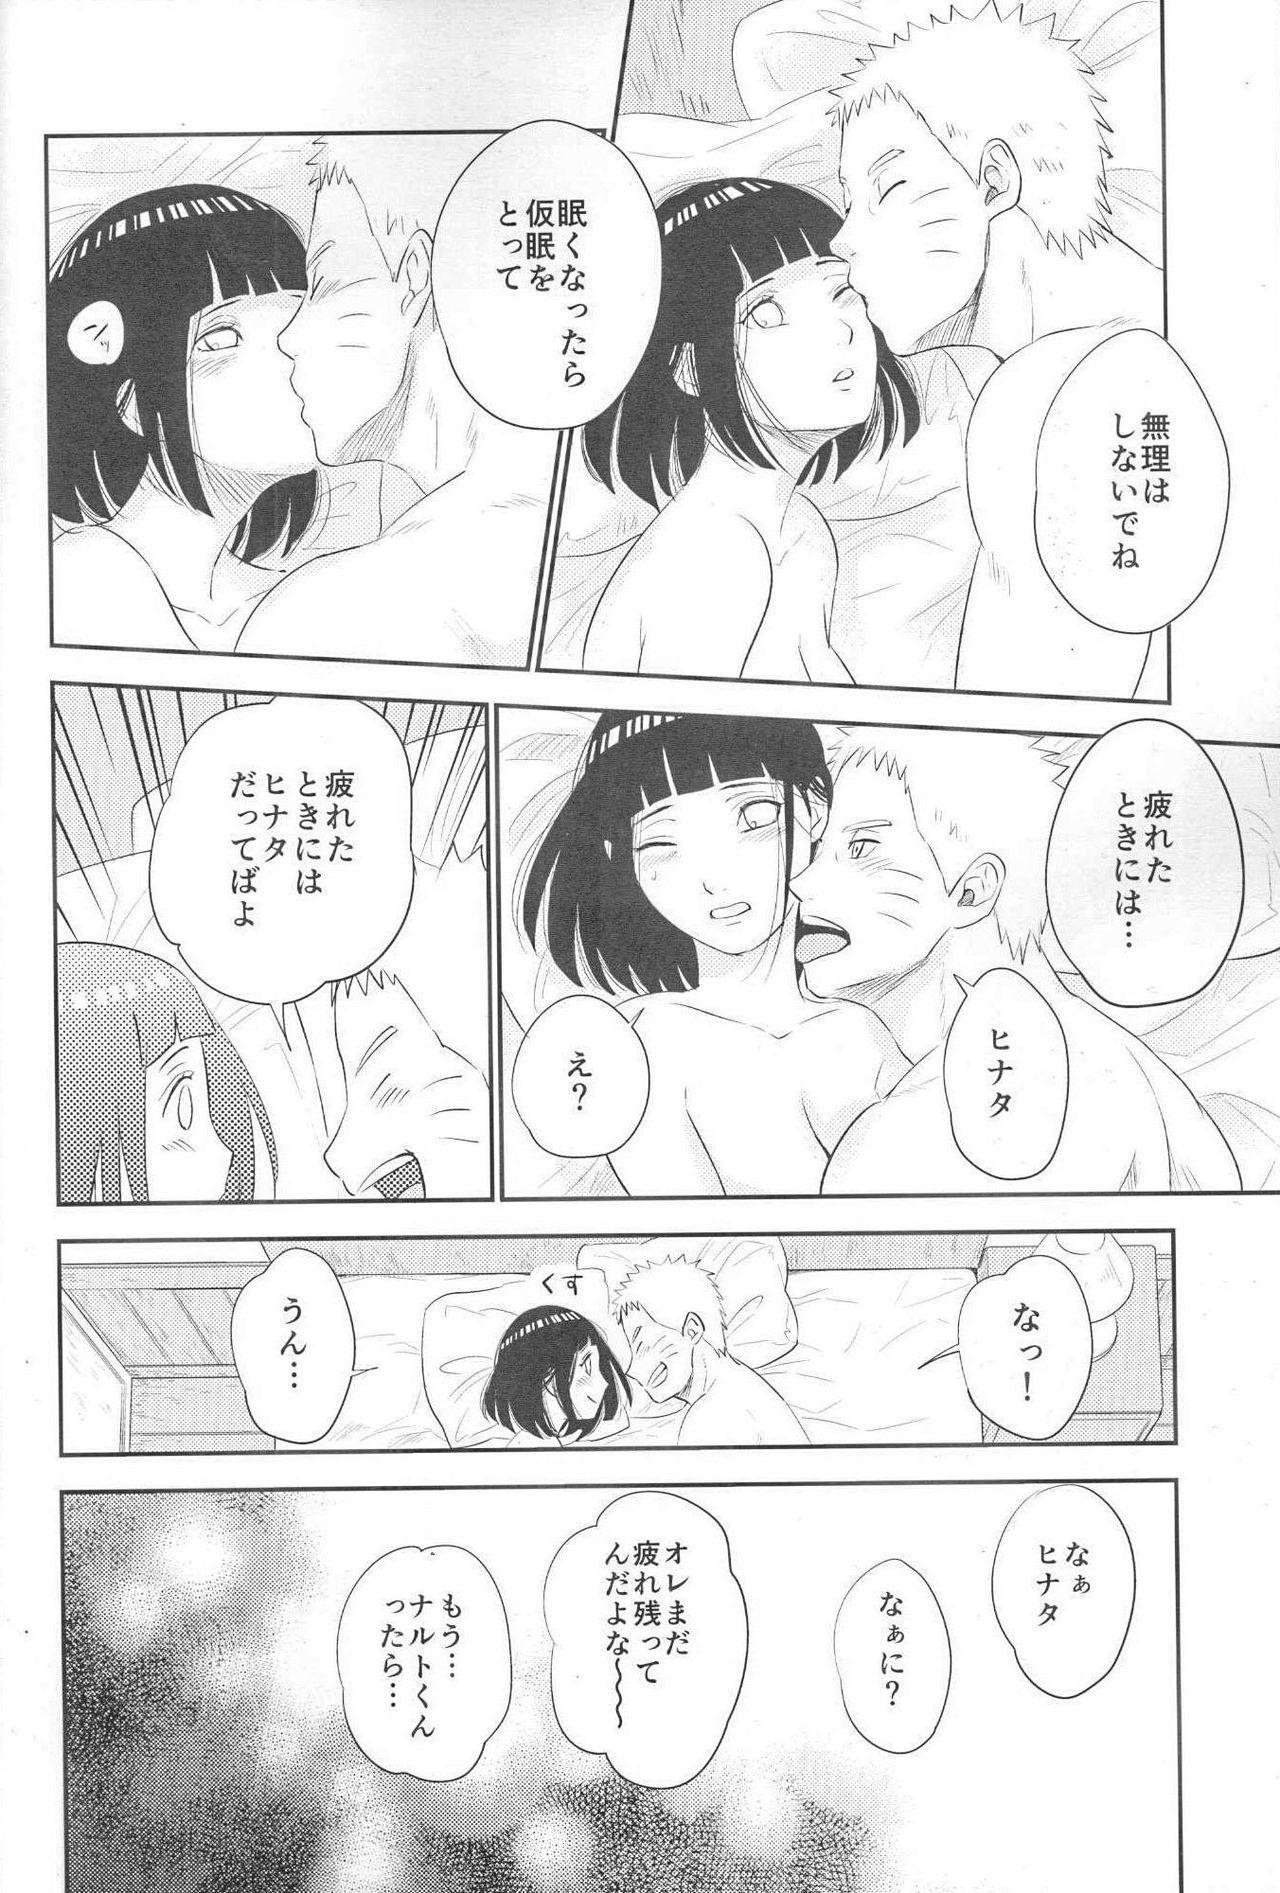 Fuufu no Jikan 30